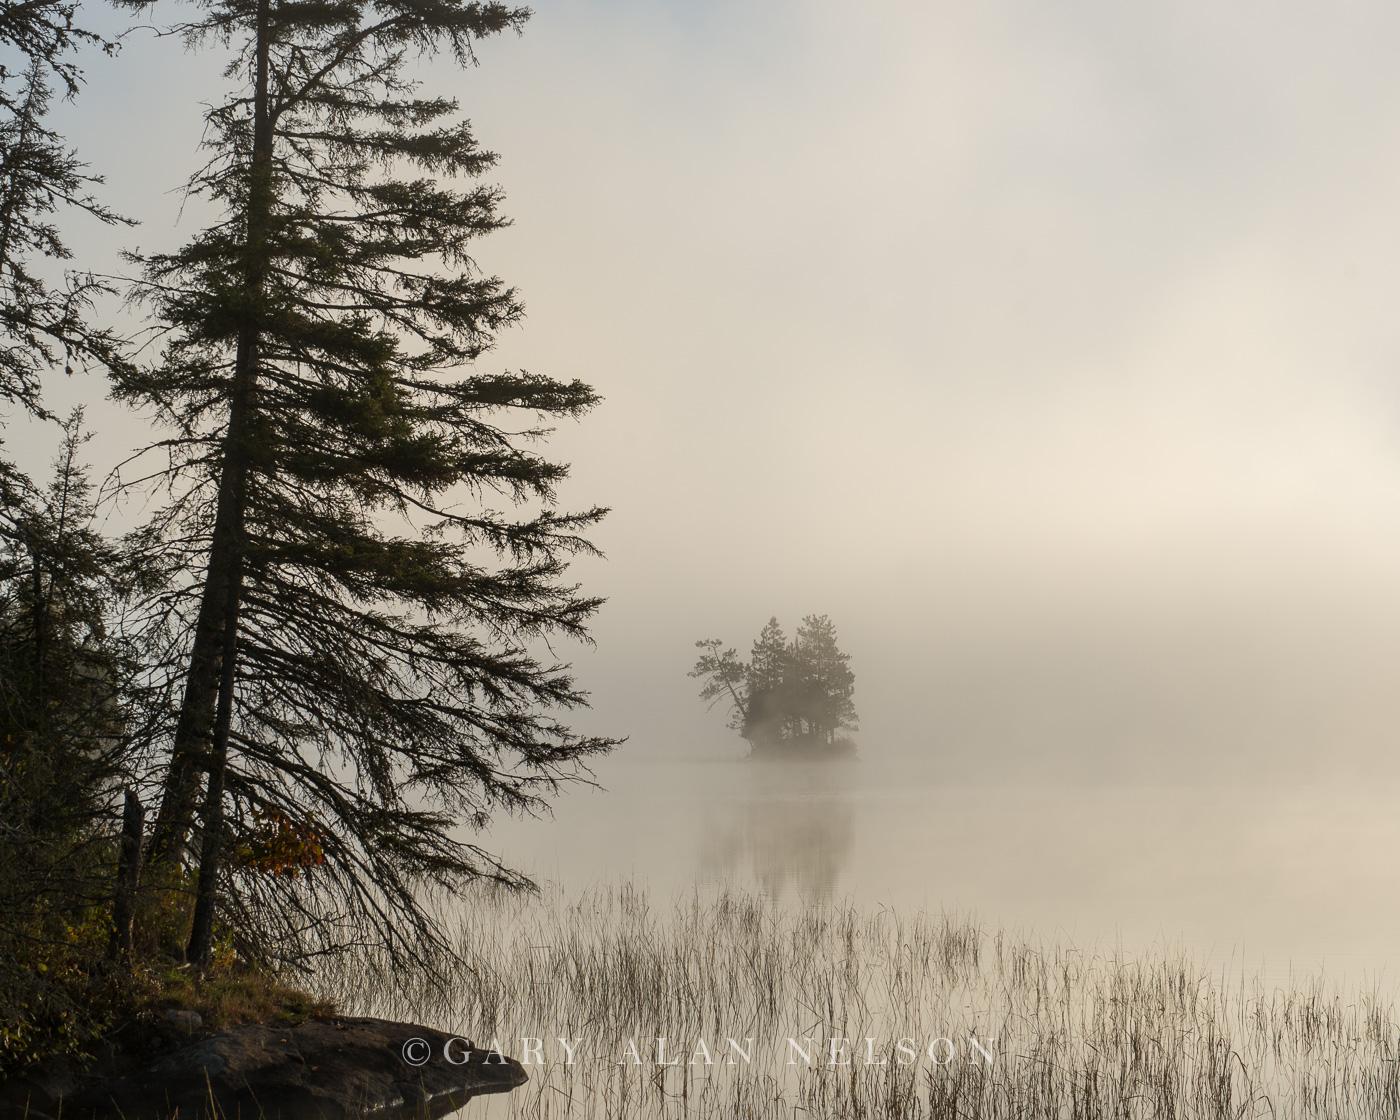 Island in fog, at dawn, Superior National Forest, Minnesota